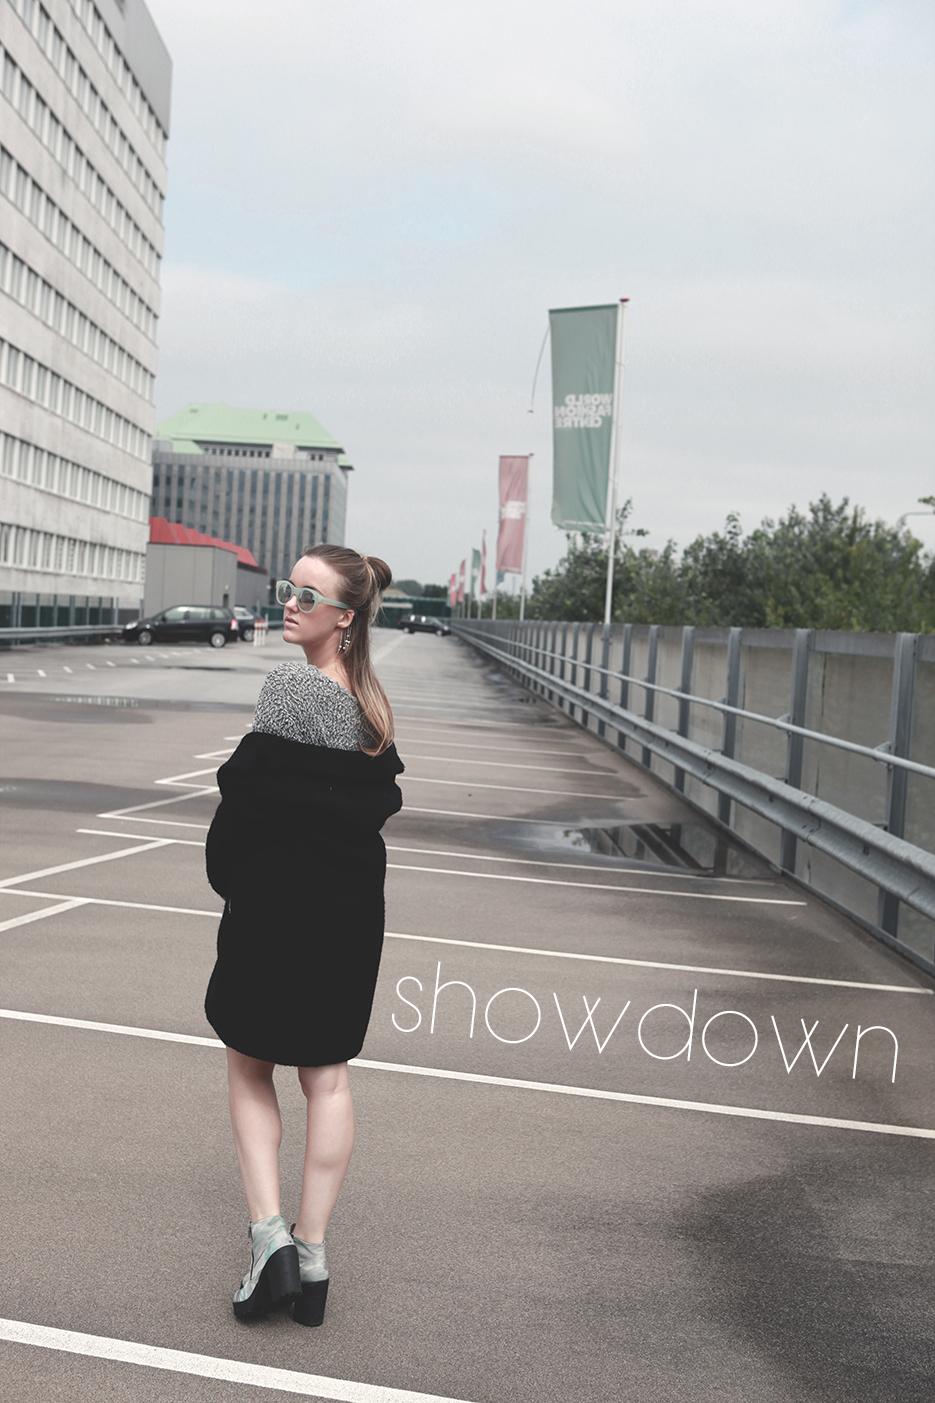 POSE-showdown-1